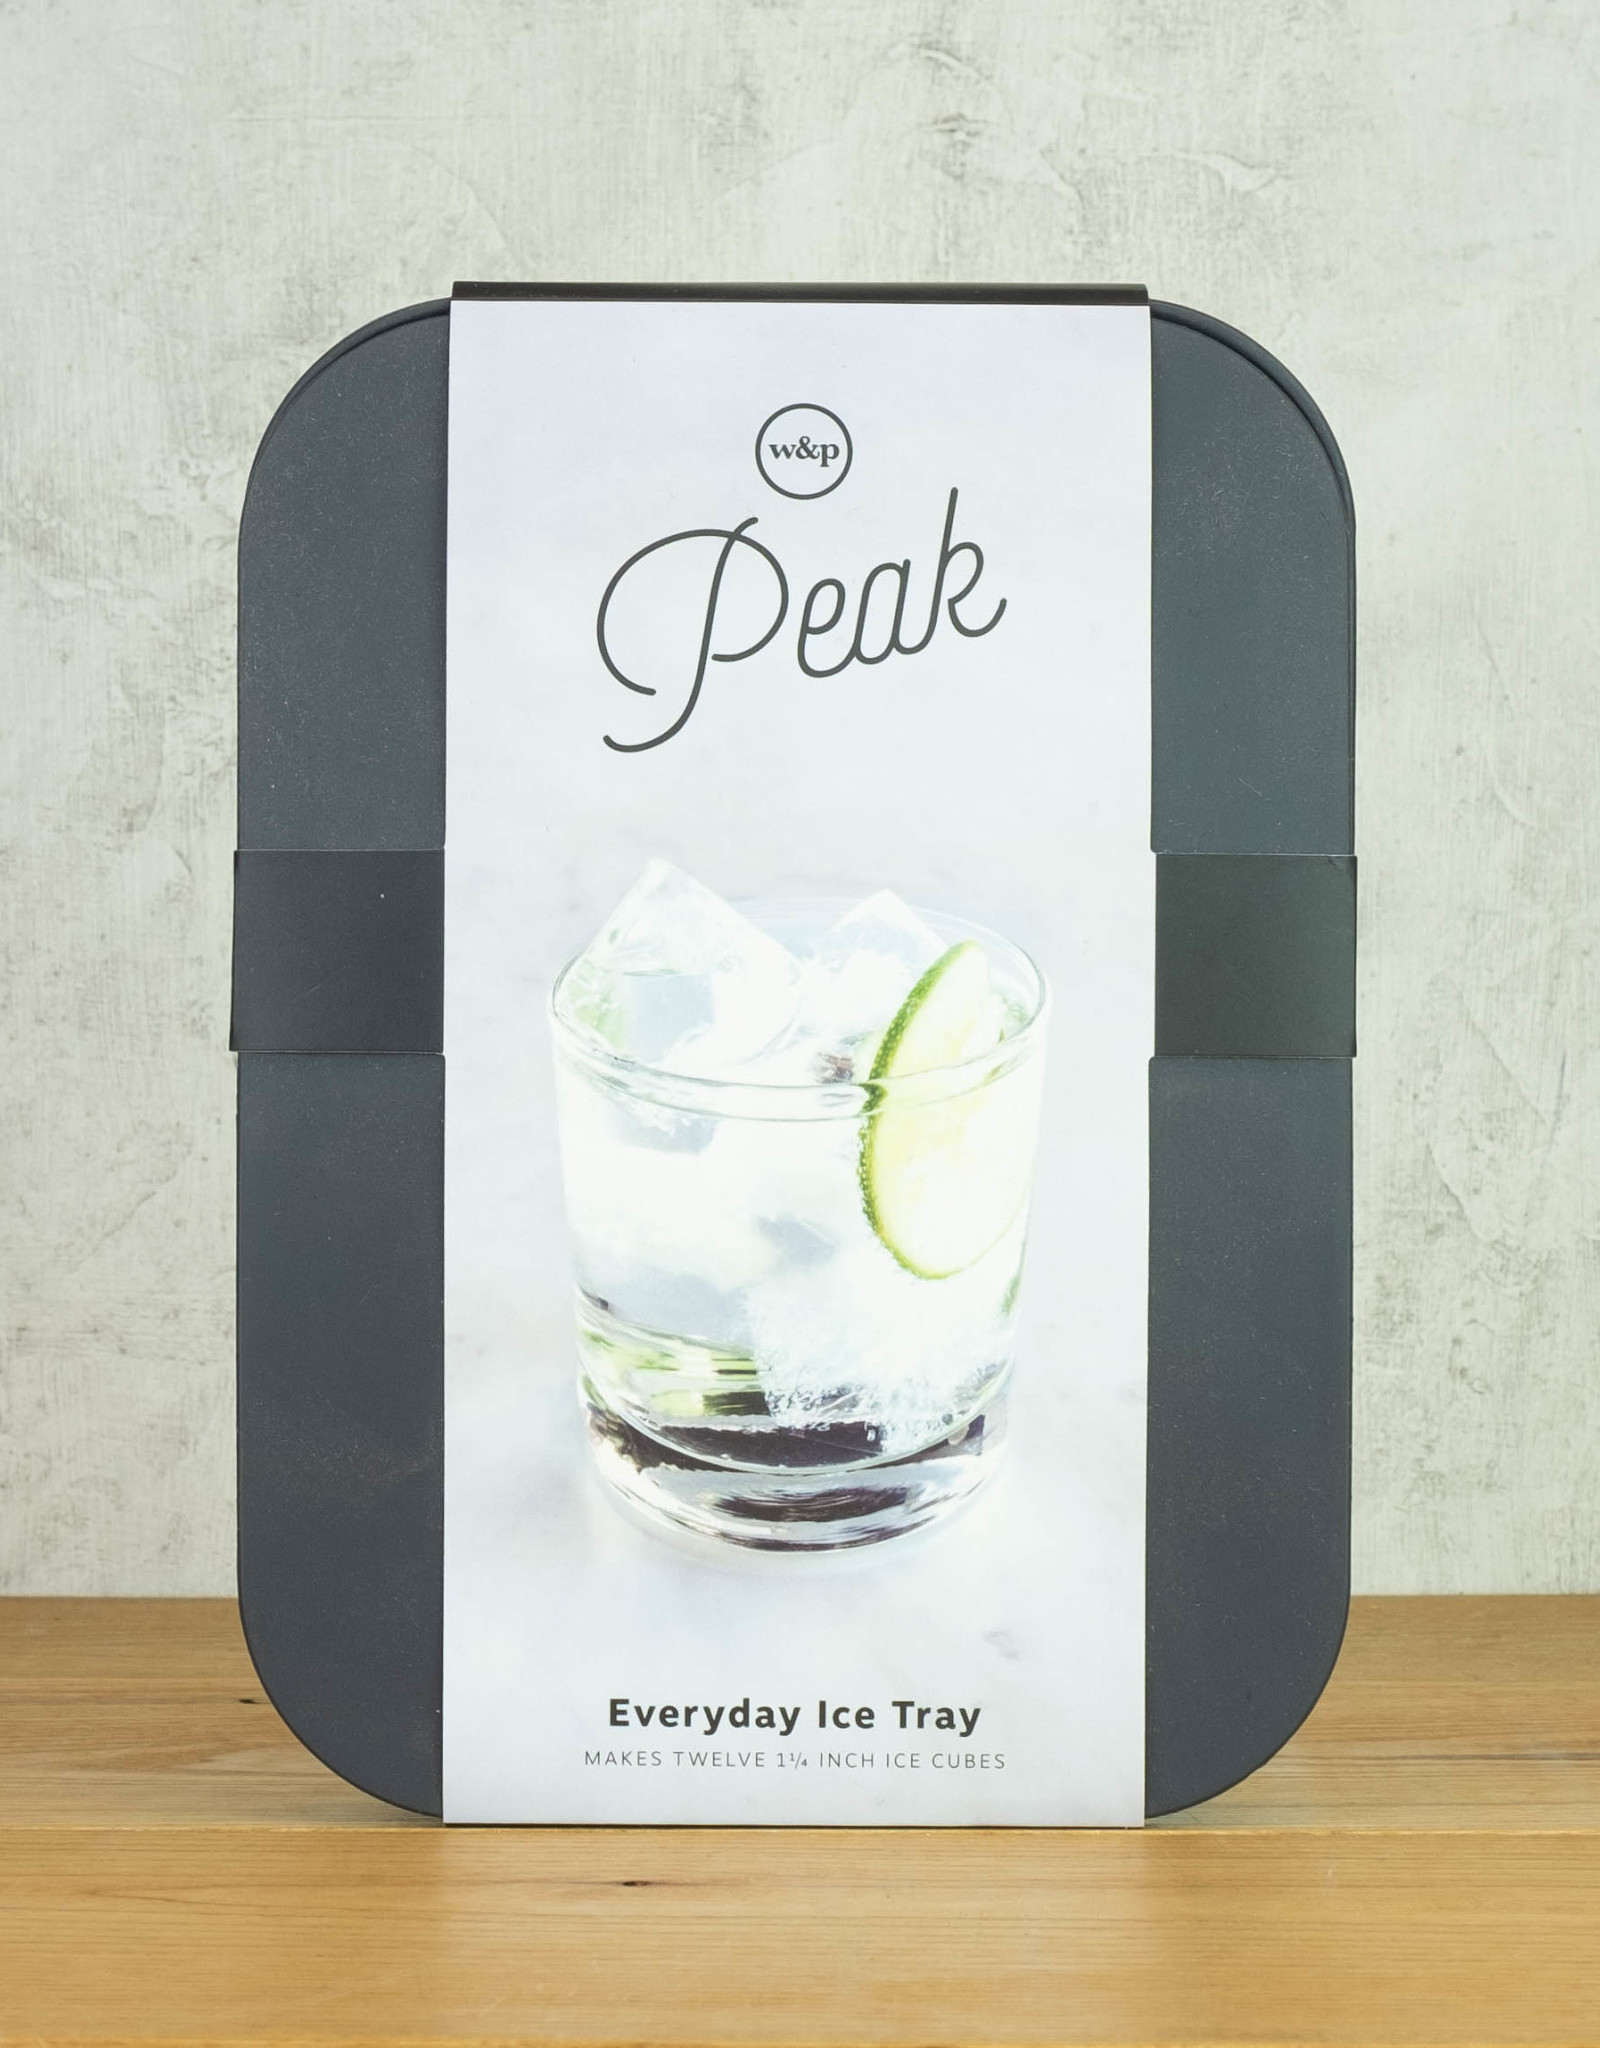 Peak Every Day Ice Tray